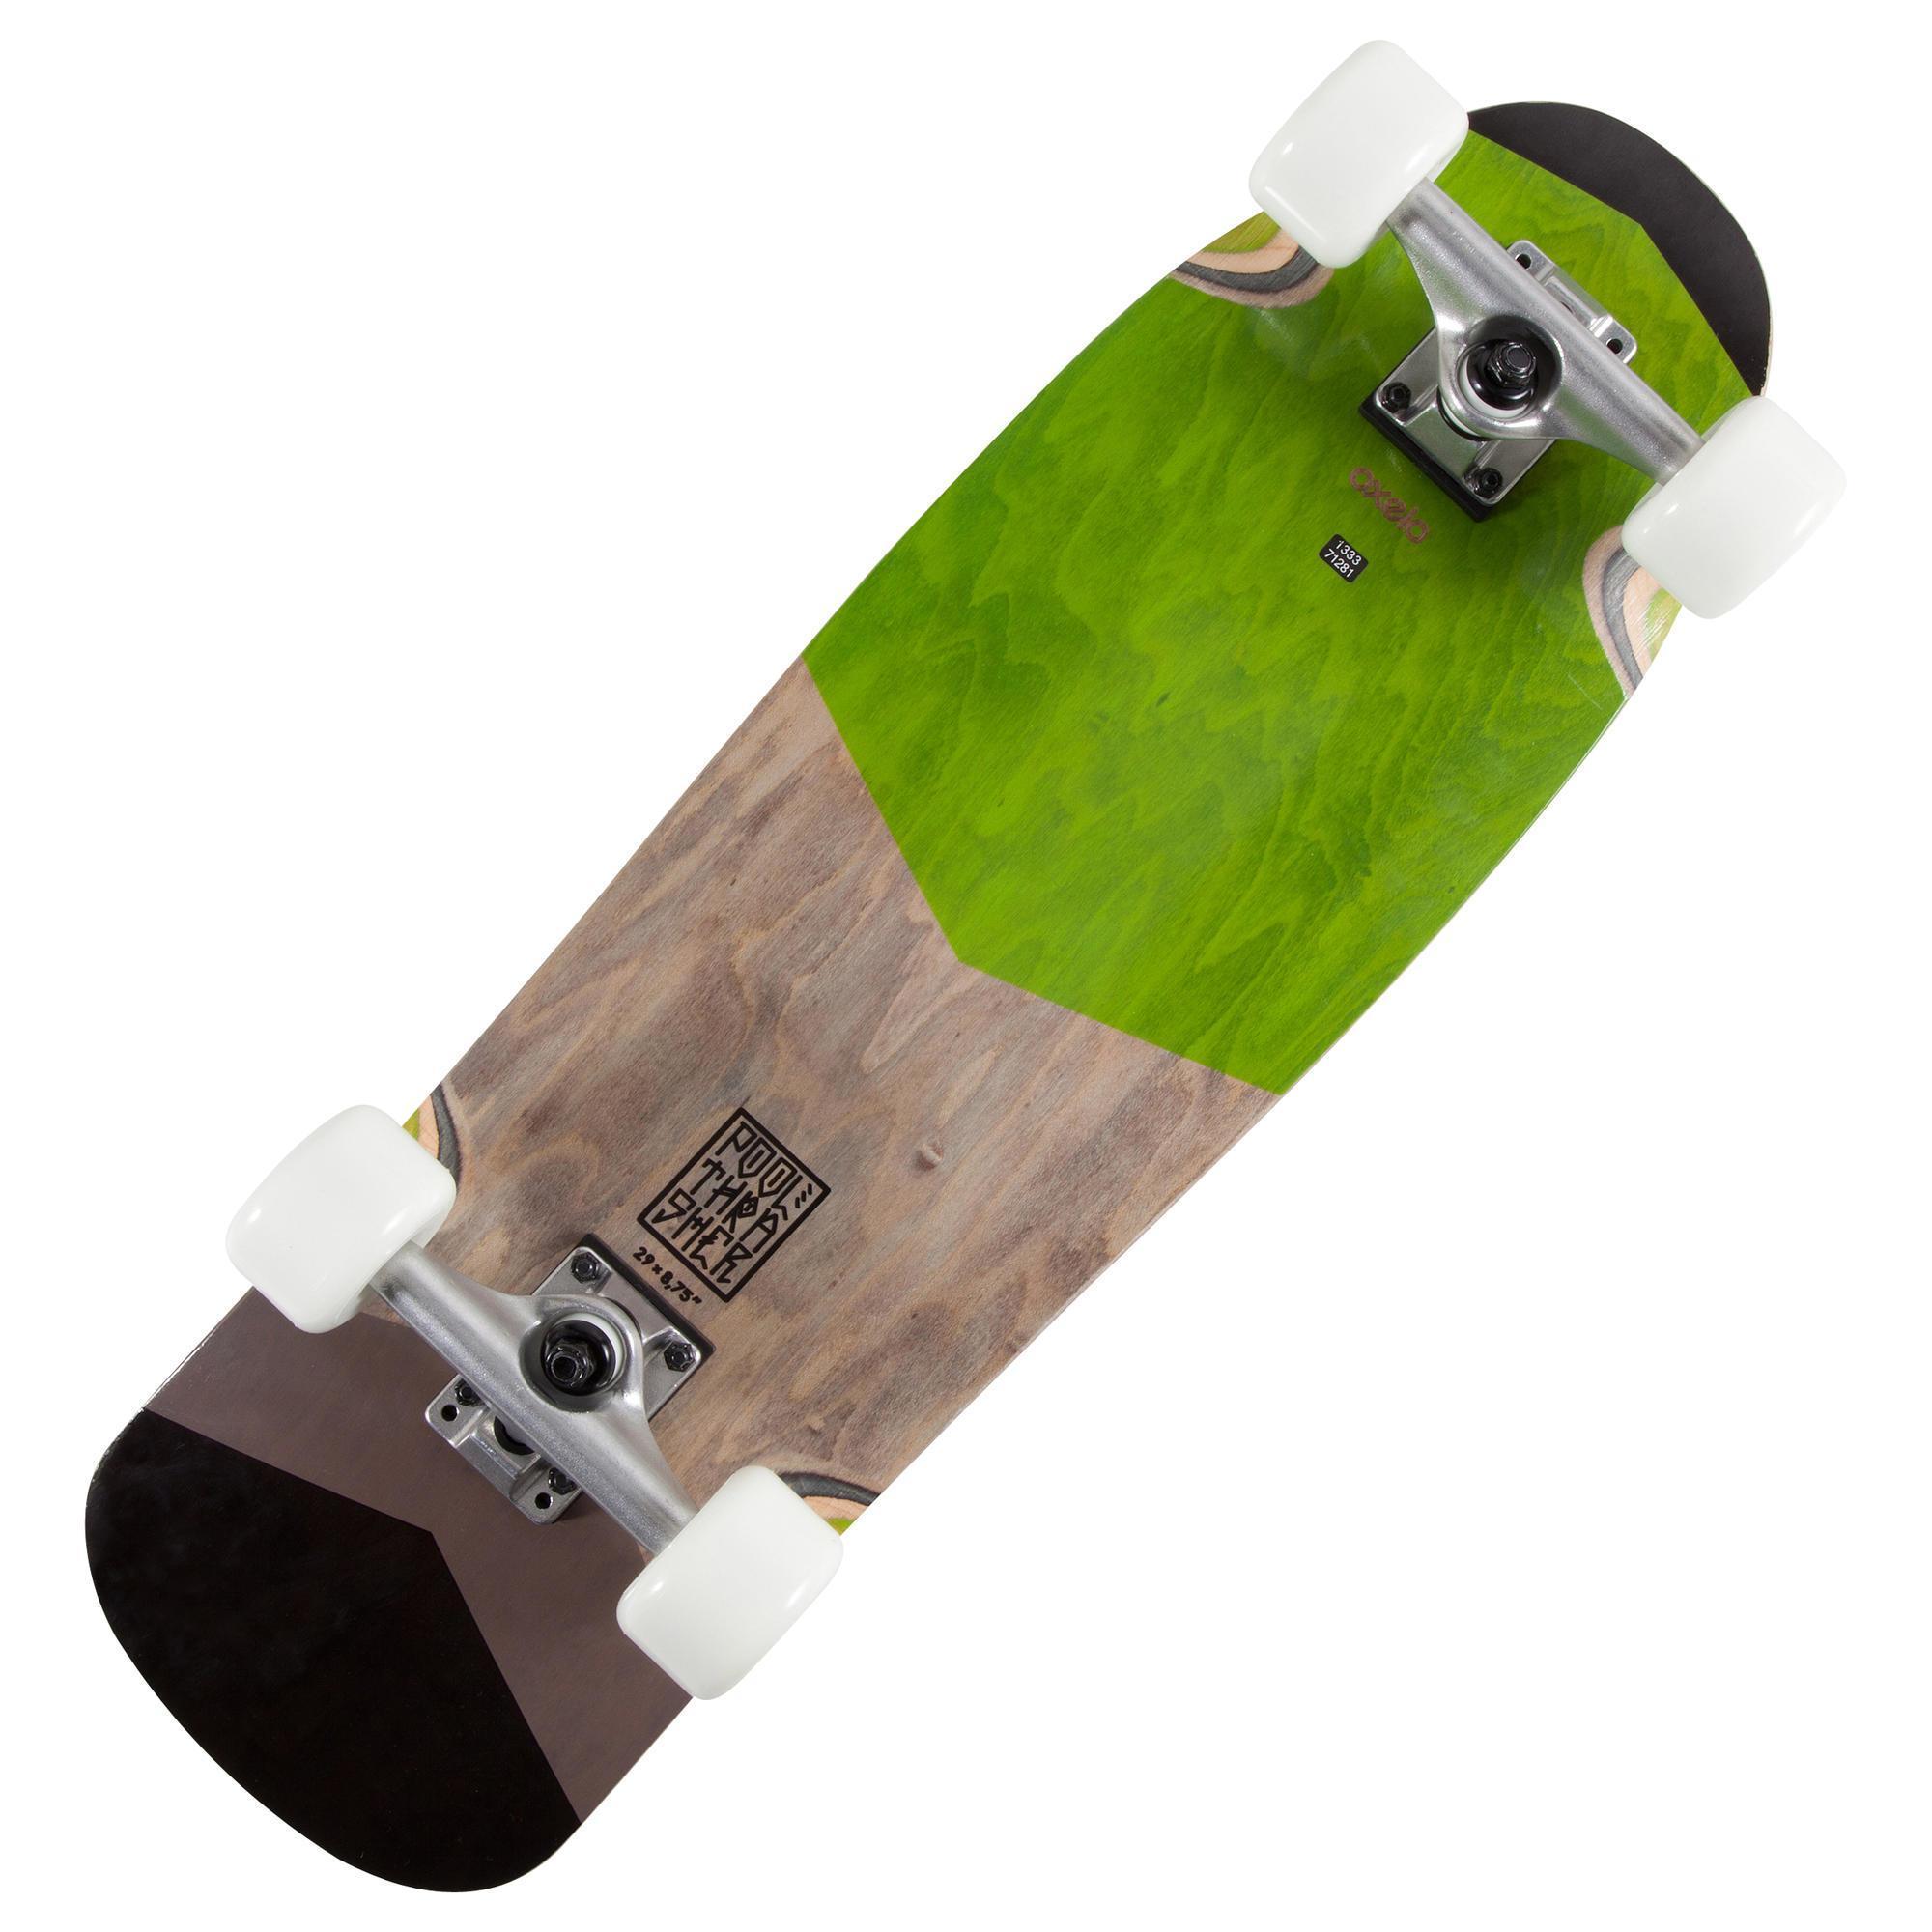 old school cruiser skateboard pool green oxelo. Black Bedroom Furniture Sets. Home Design Ideas